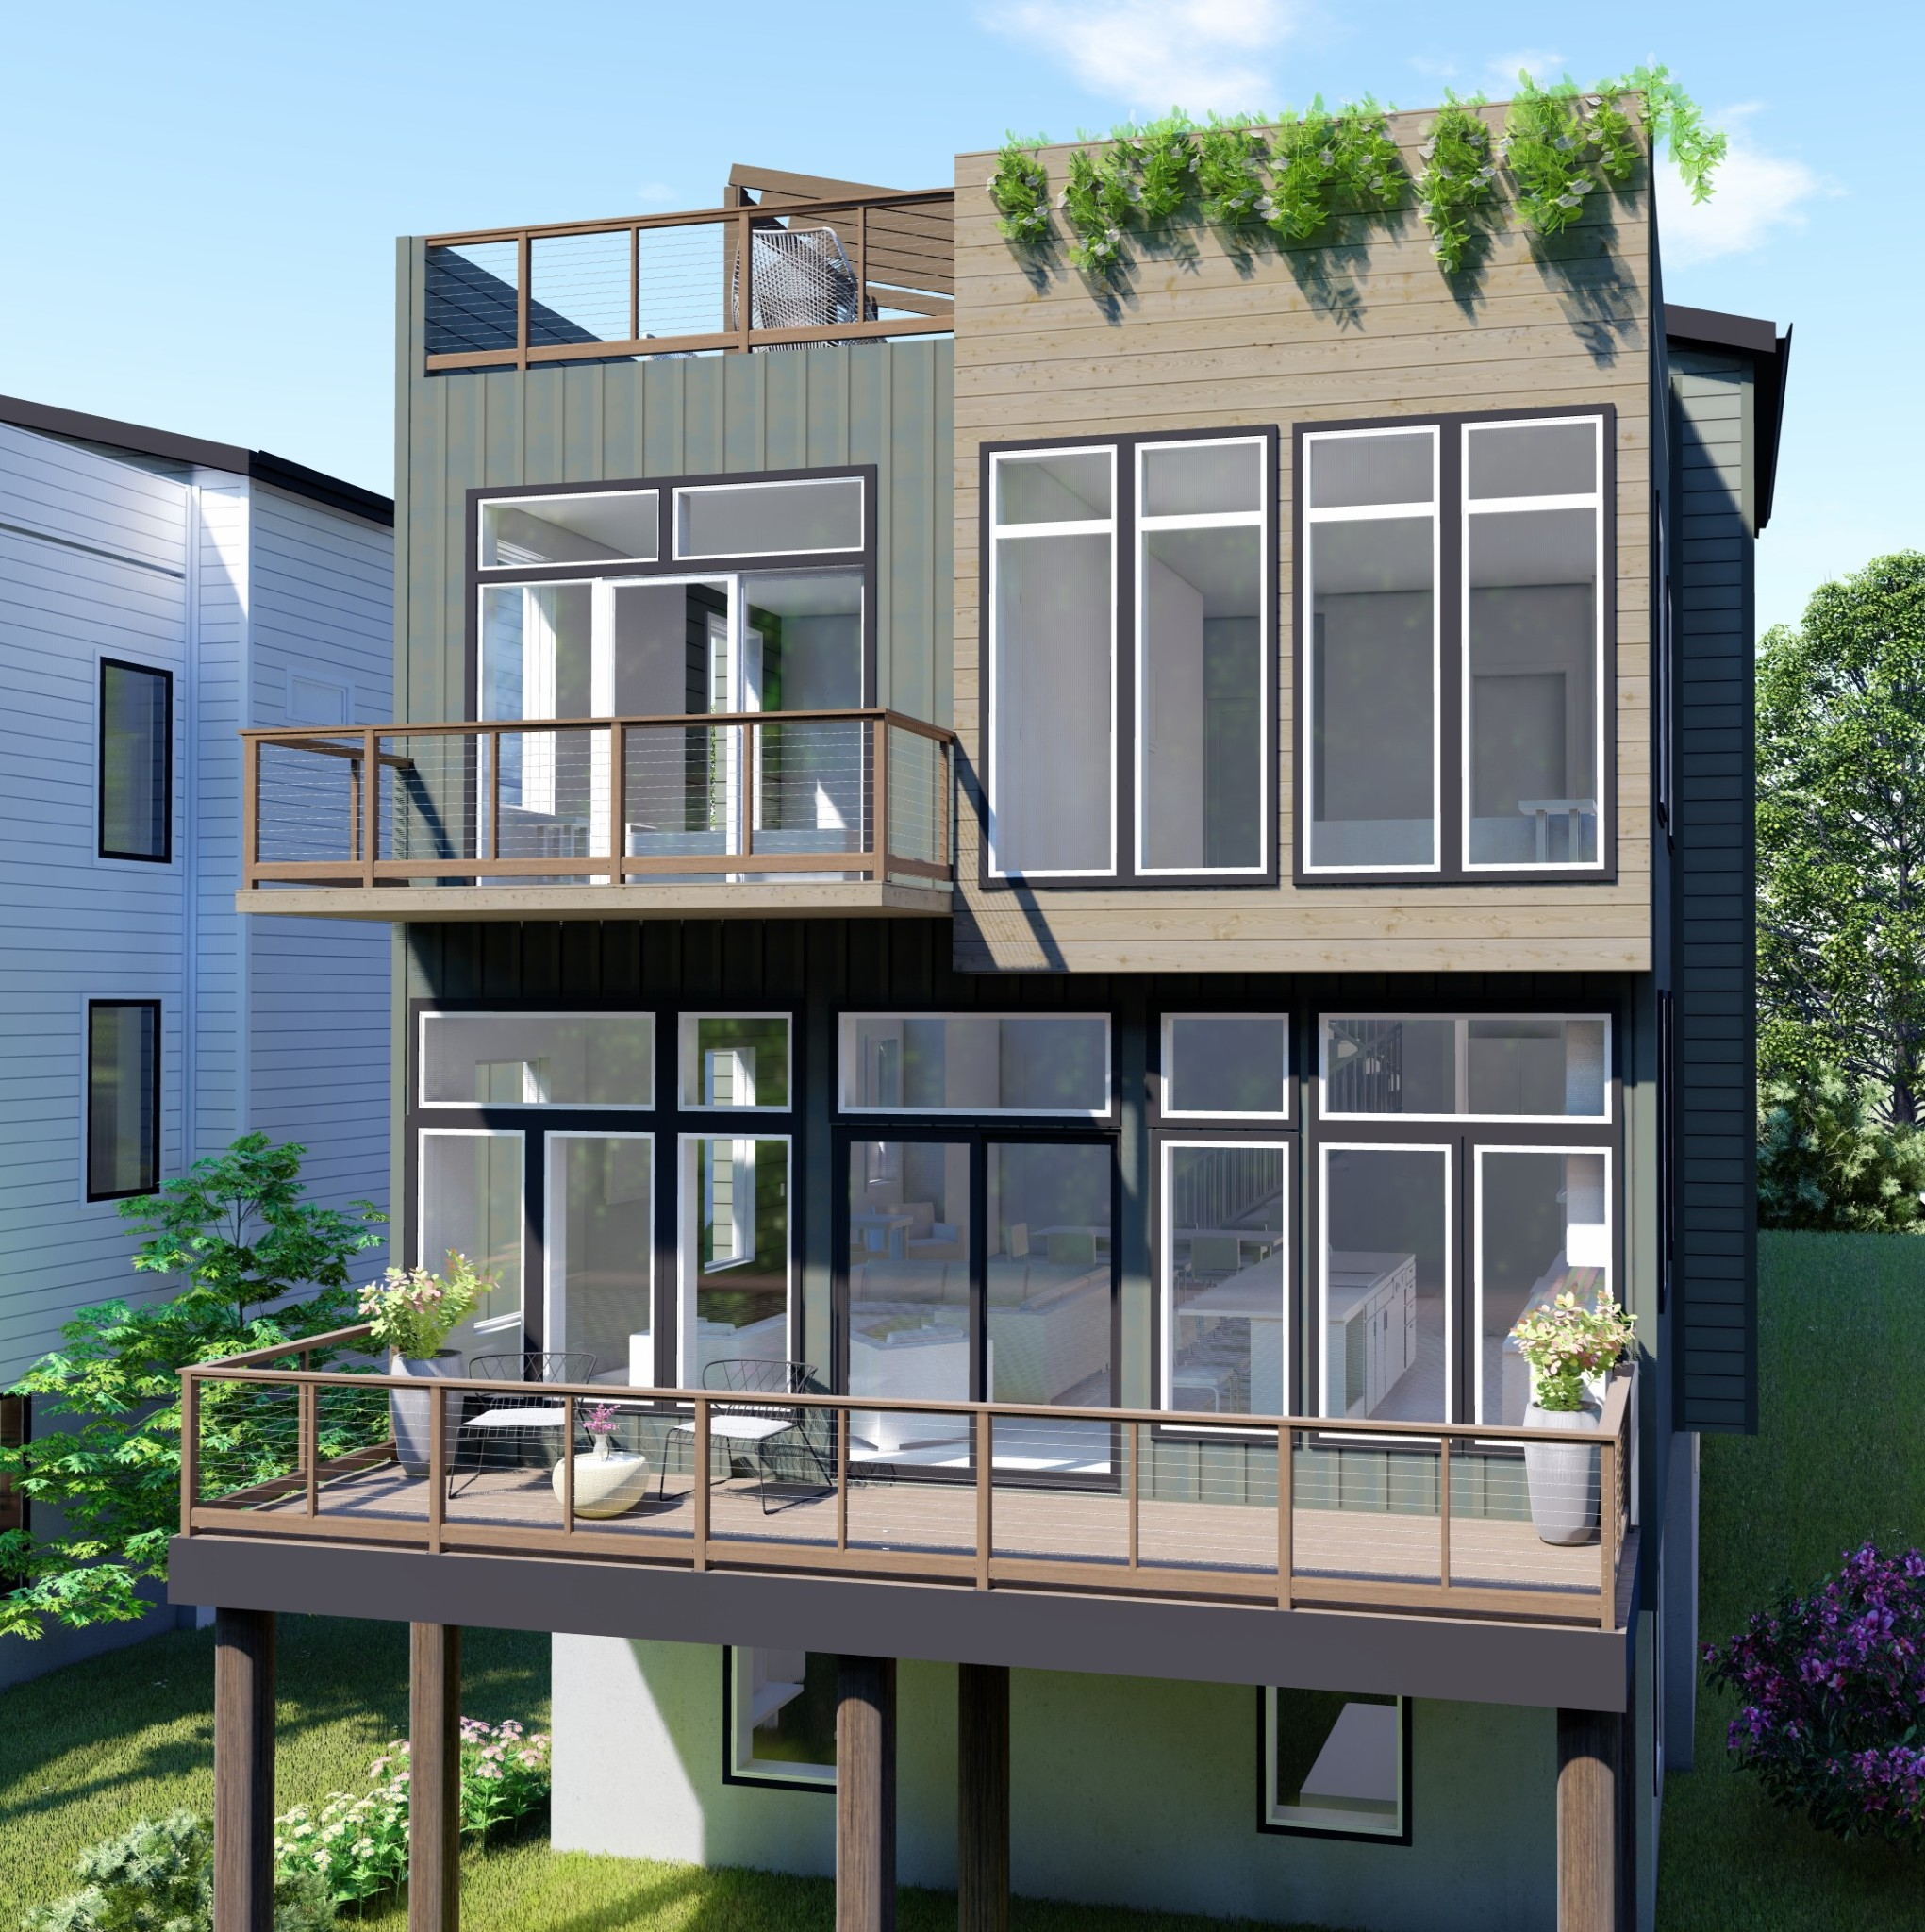 1115 Ozark St, Nashville, TN 37206 - Nashville, TN real estate listing